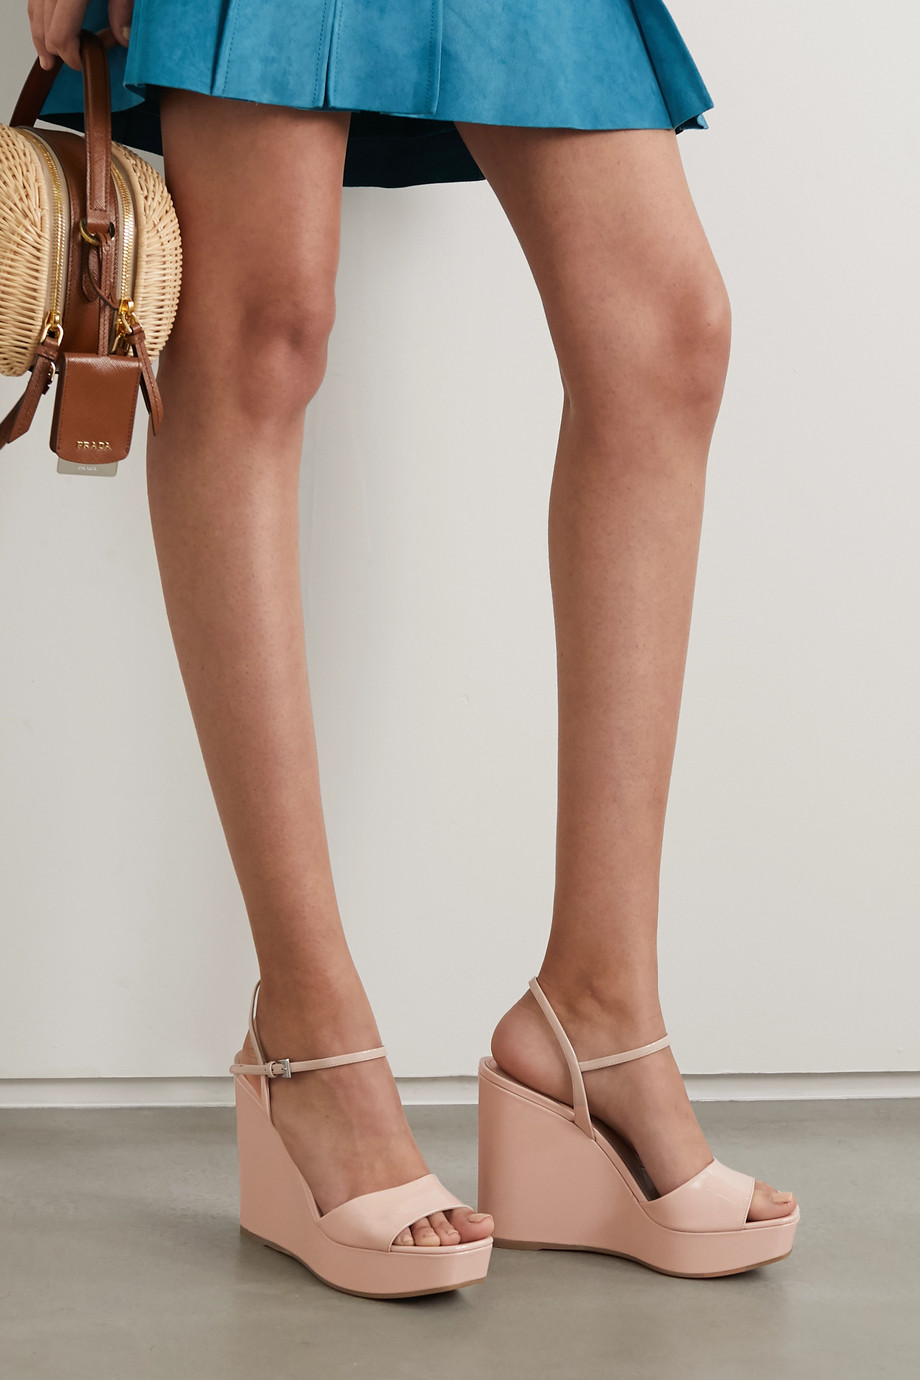 Prada Patent-leather wedge sandals